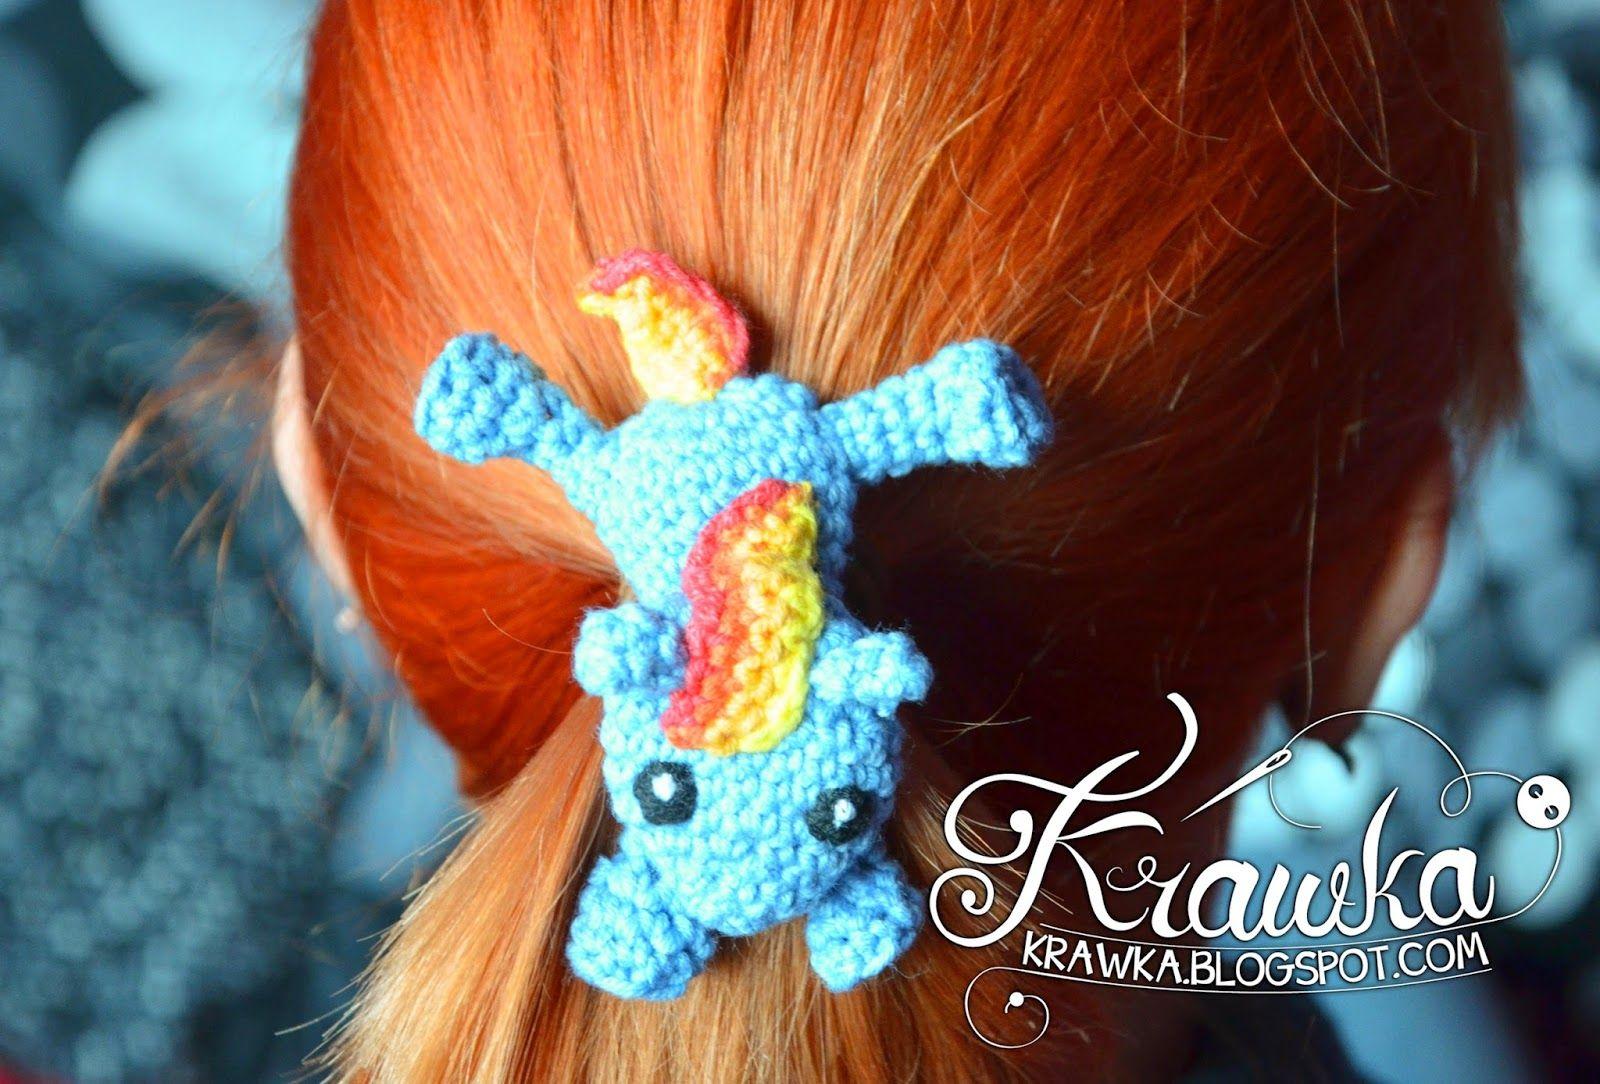 Krawka: Crochet hair clip - My little Pony - Rainbow Dash - free ...